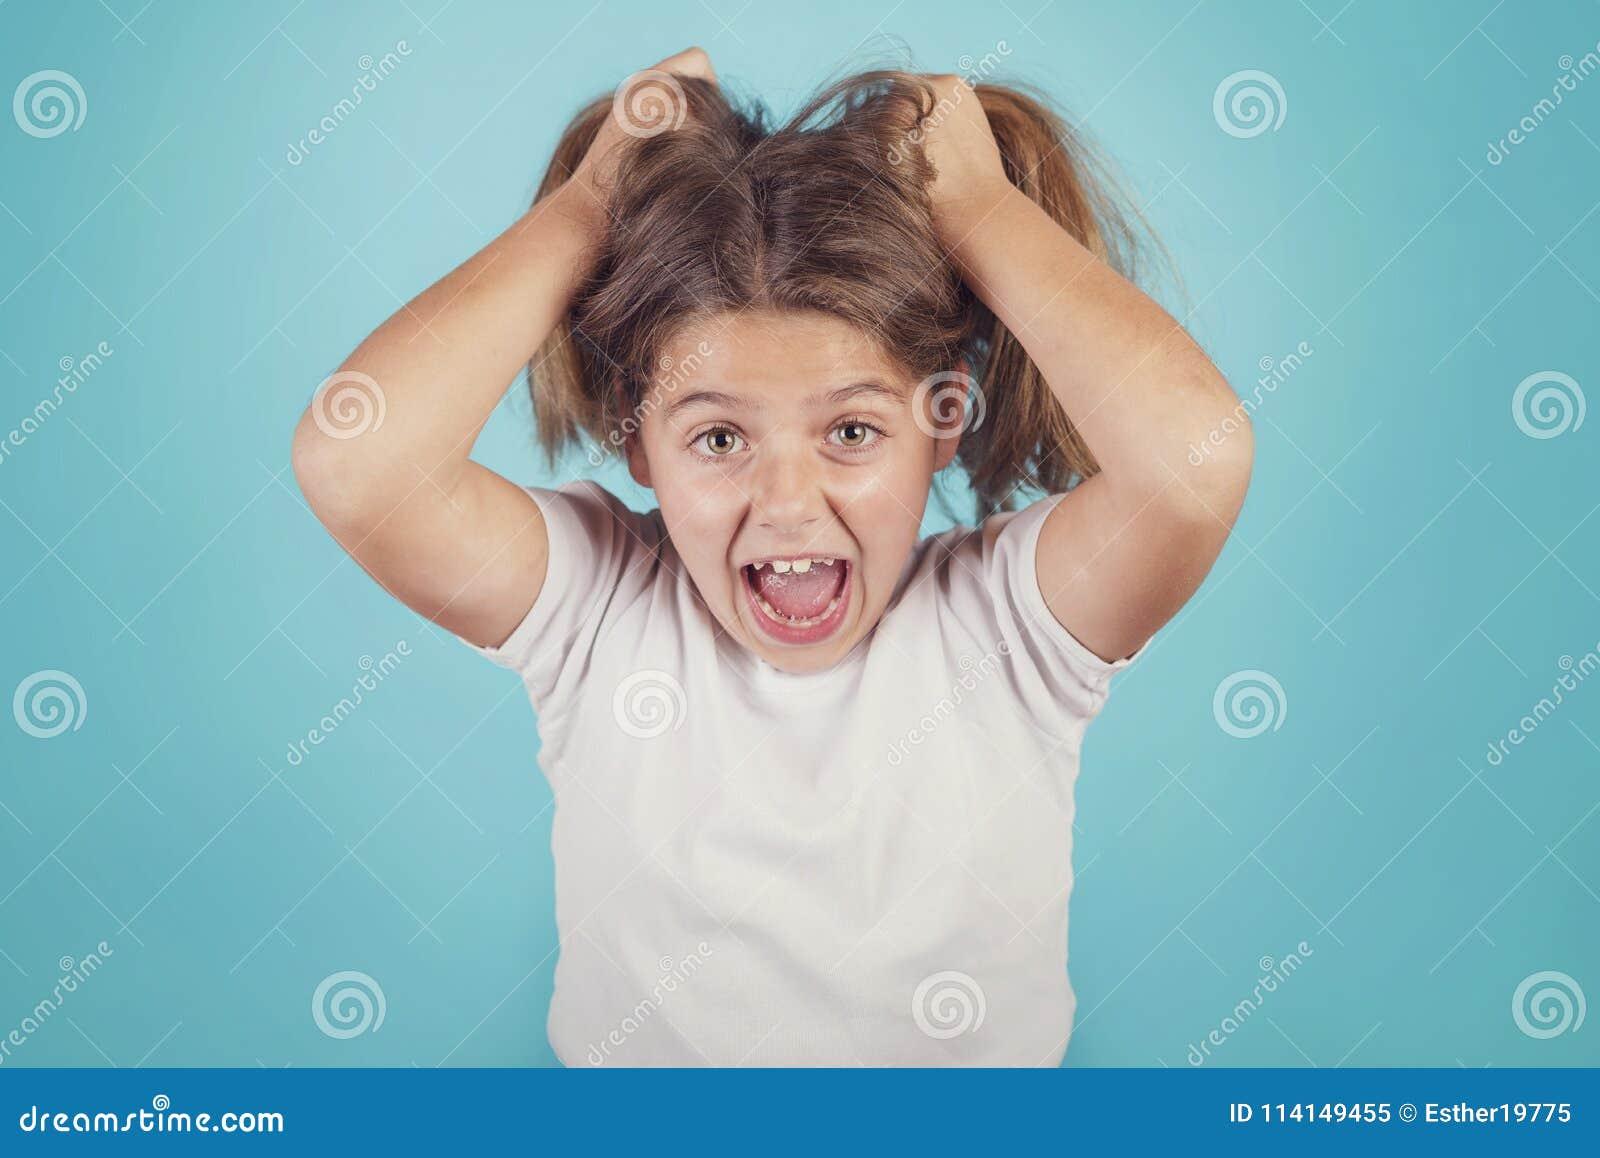 Retrato de la muchacha enojada